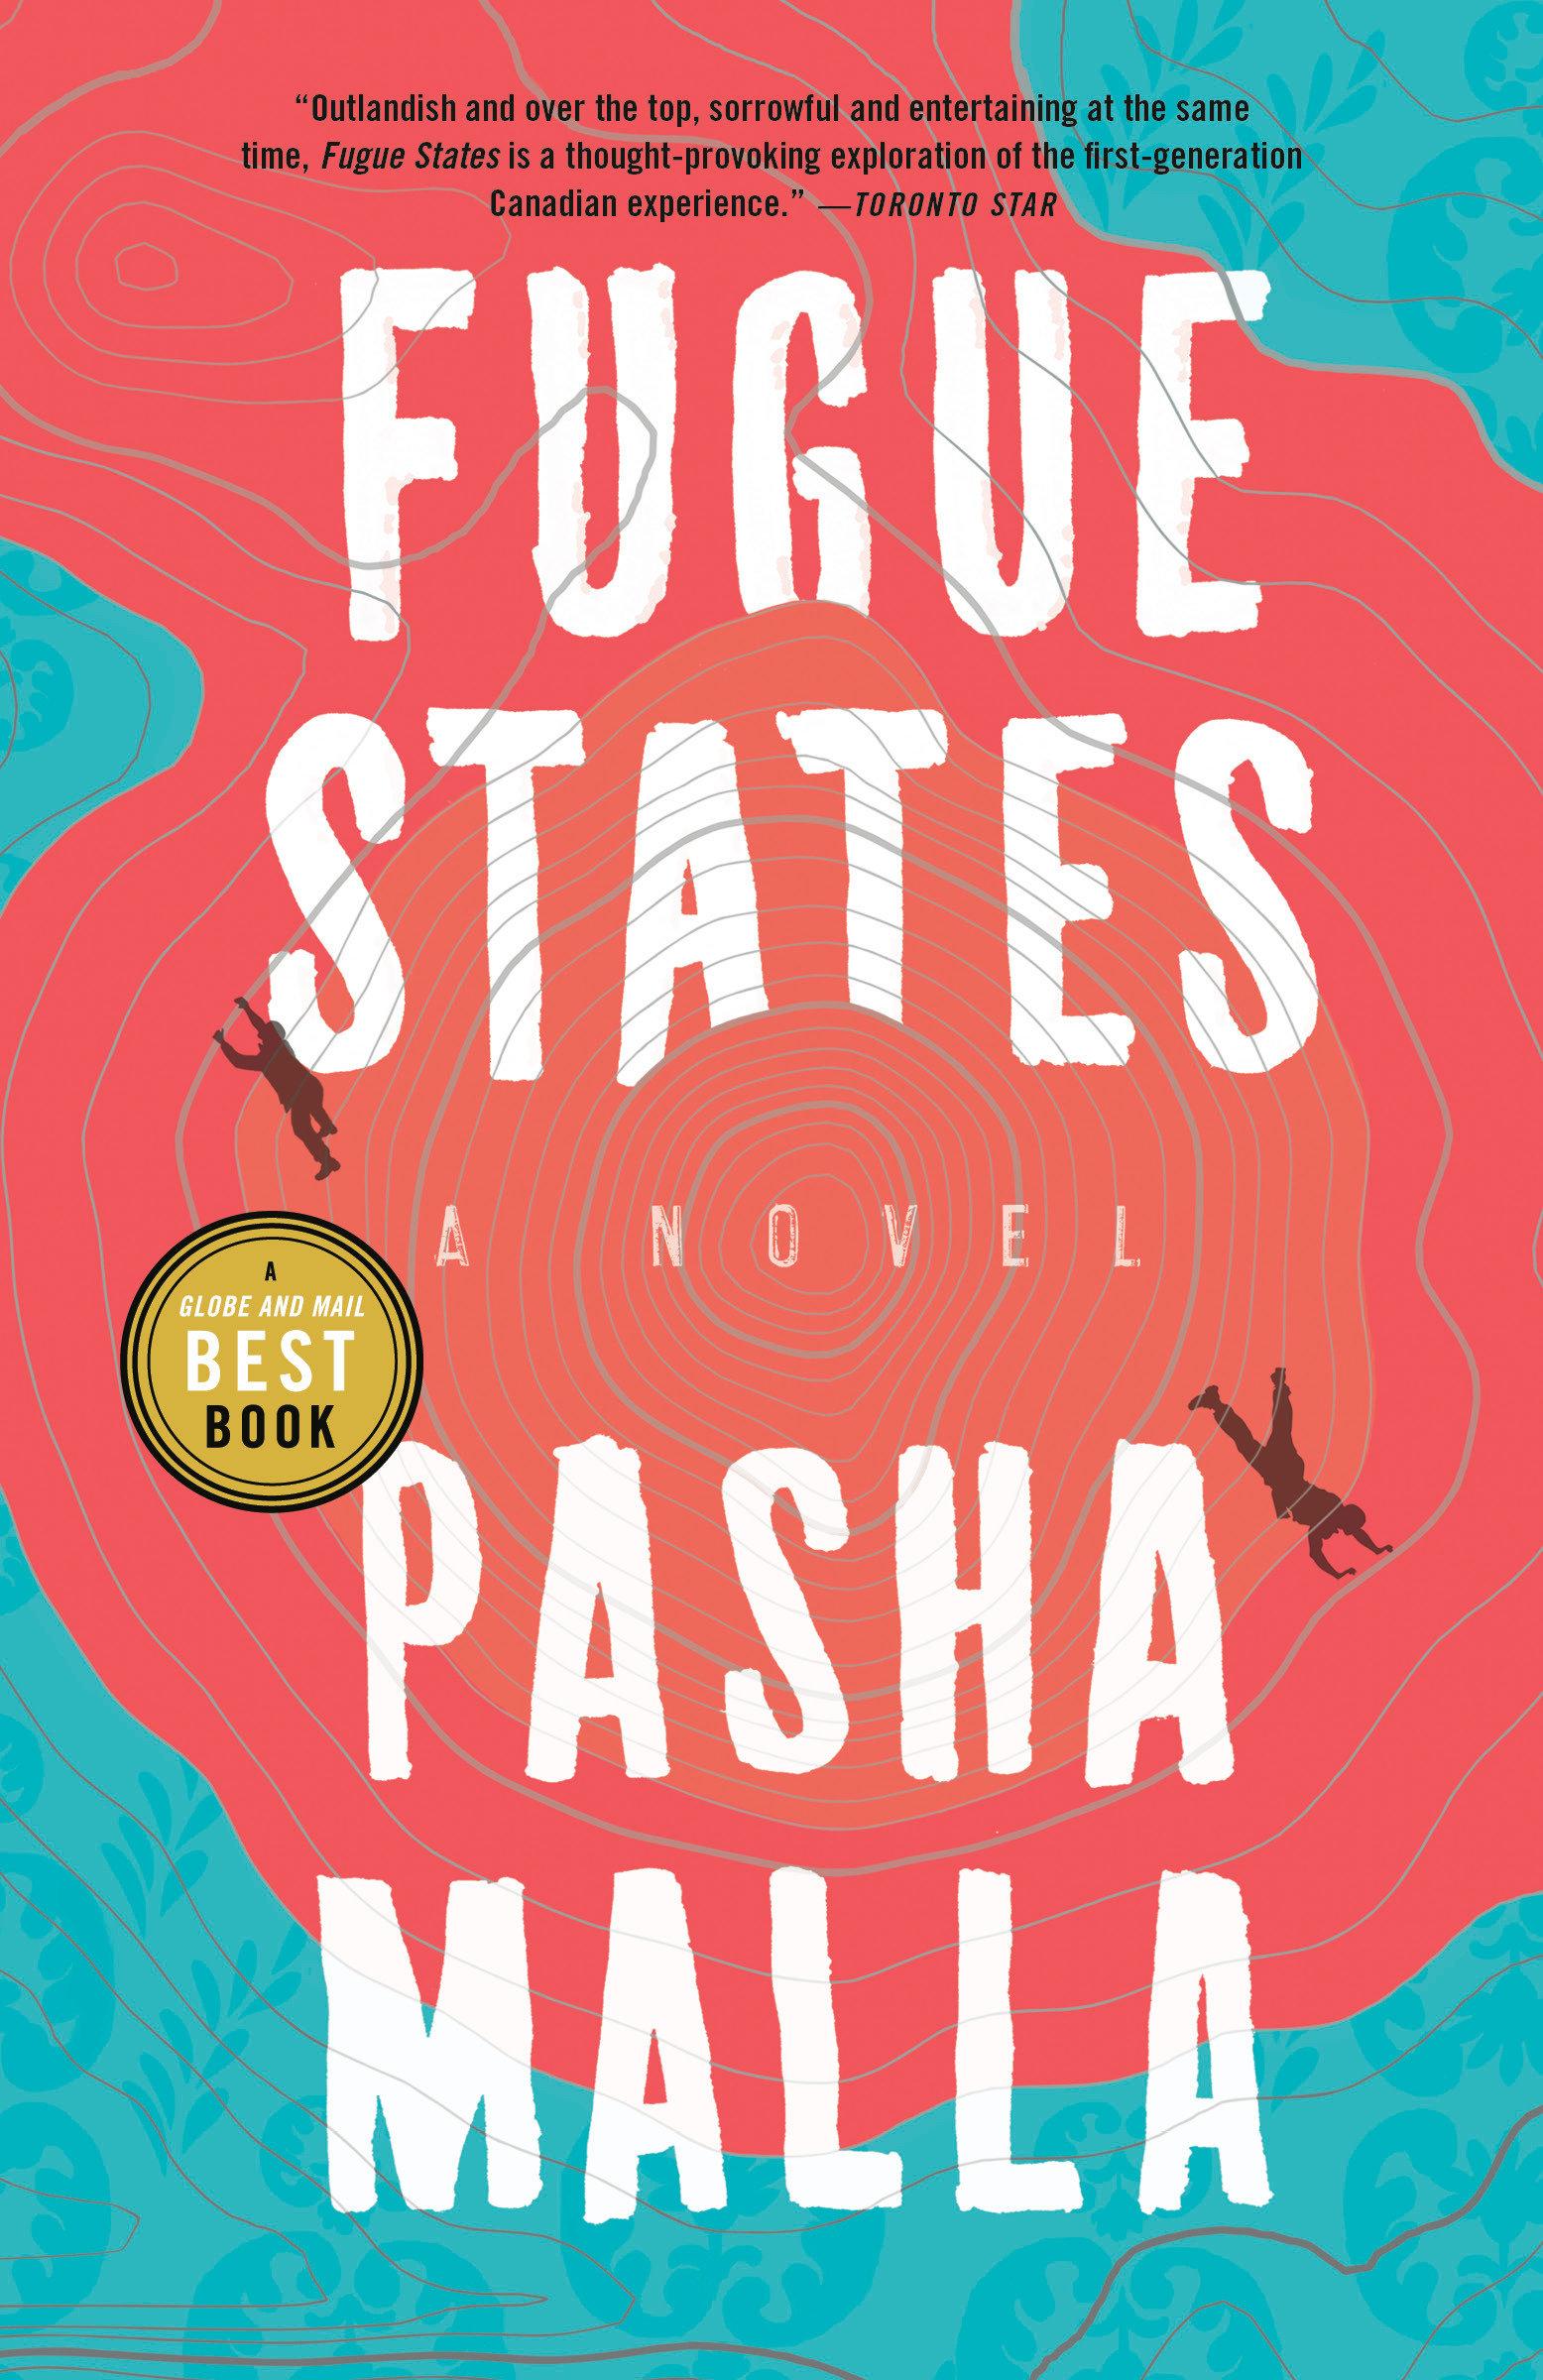 Cover Image of Fugue States